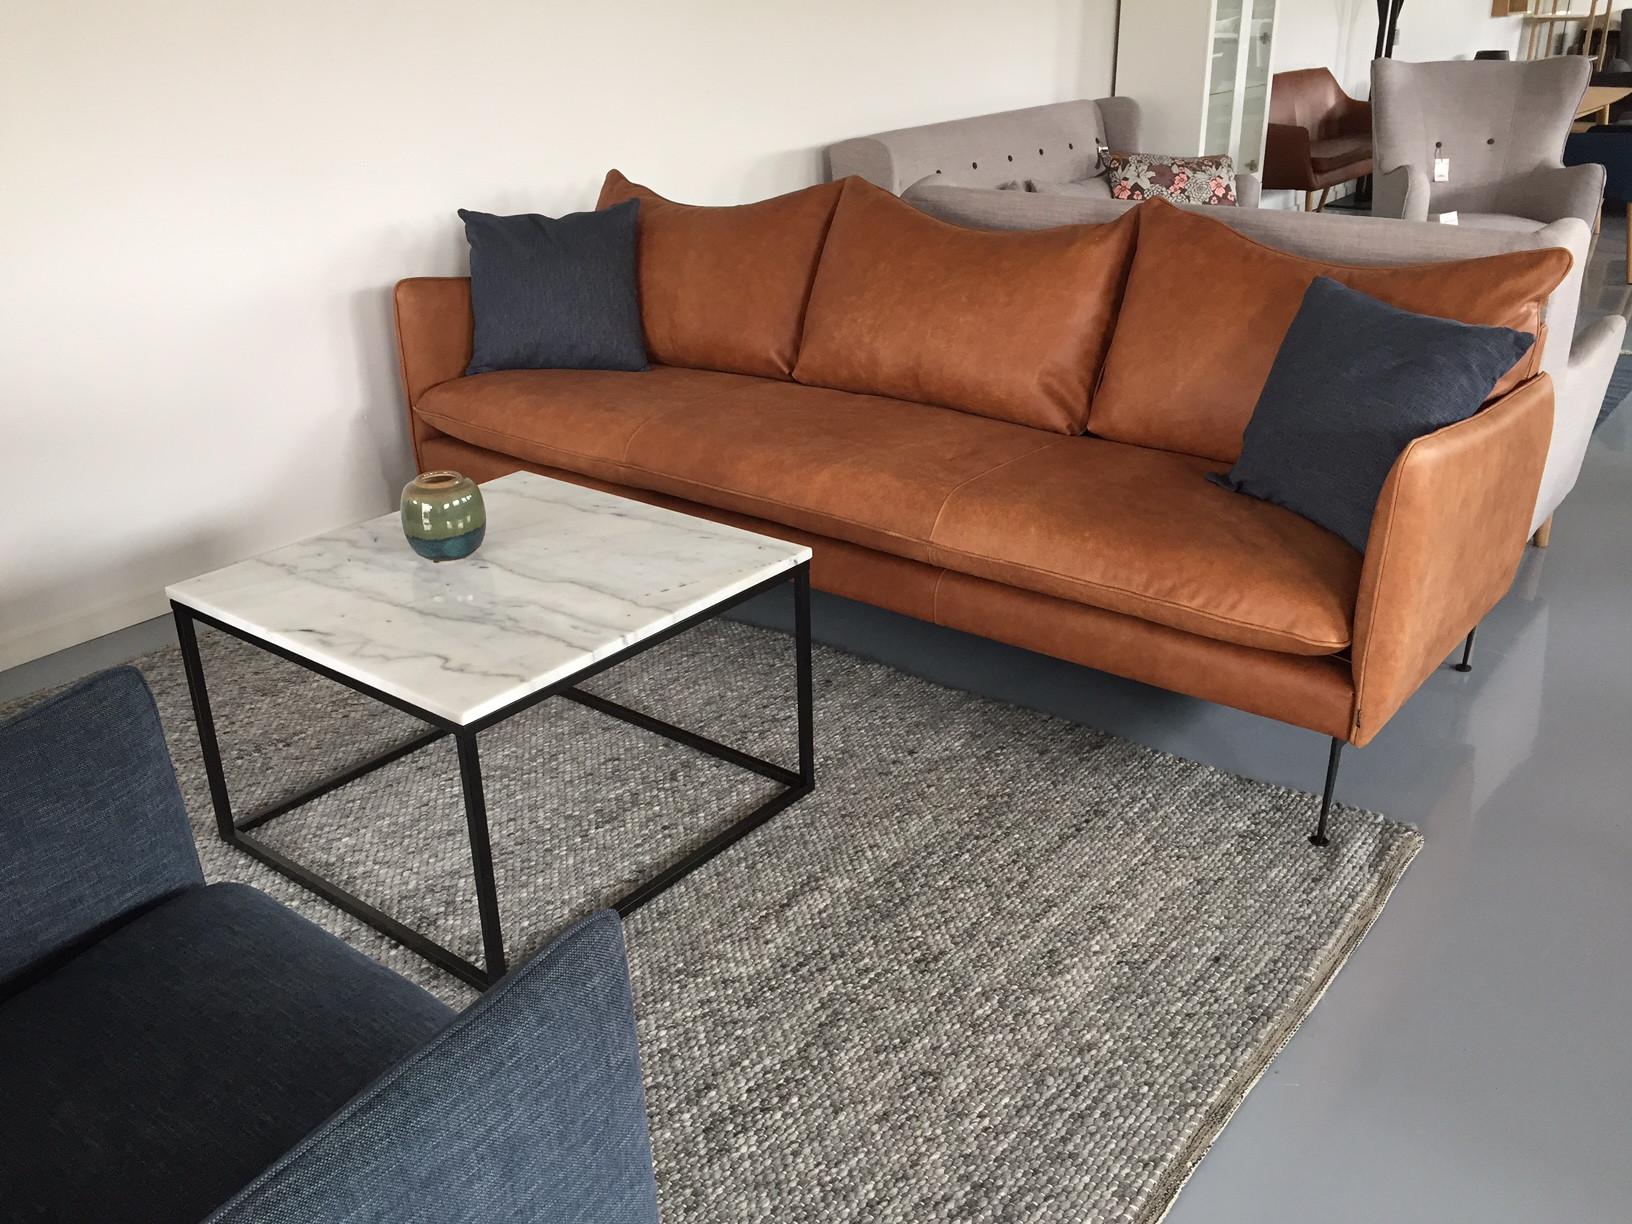 Super Cognac farvet sofa i semianilin læder. Super flot og elegant 3,5 WR04